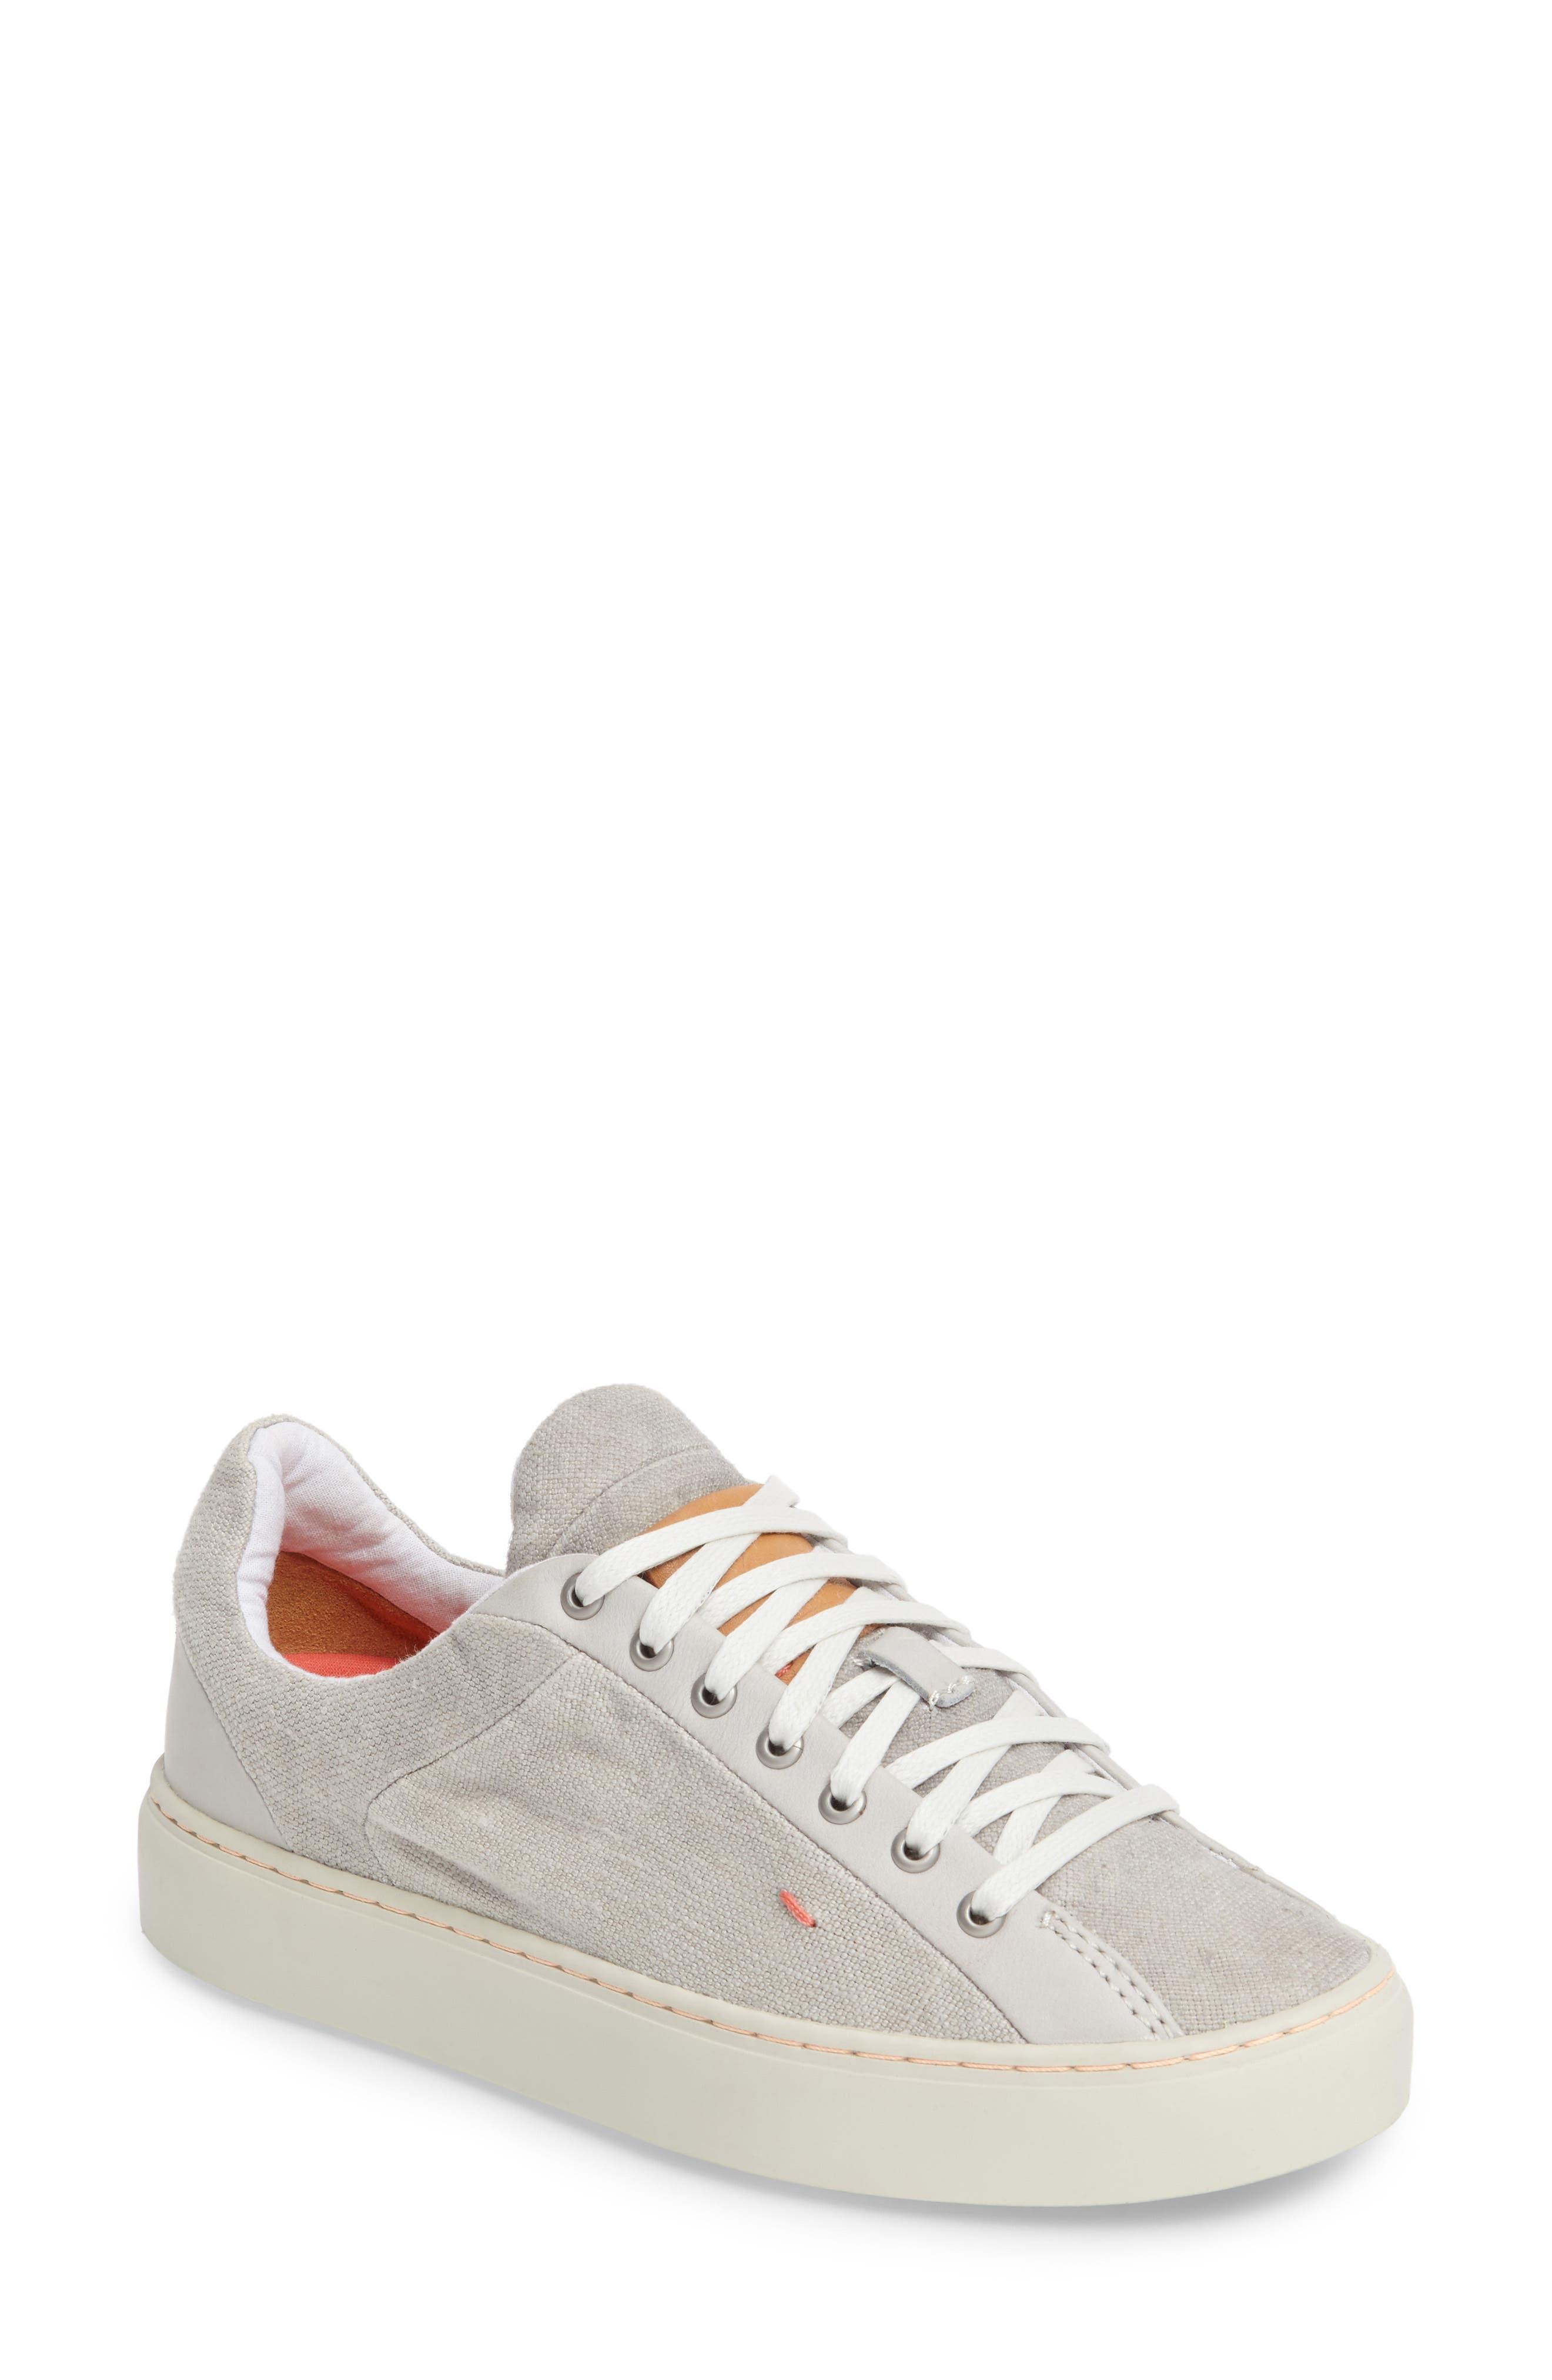 Somerville Sneaker,                             Main thumbnail 1, color,                             CONCRETE FABRIC